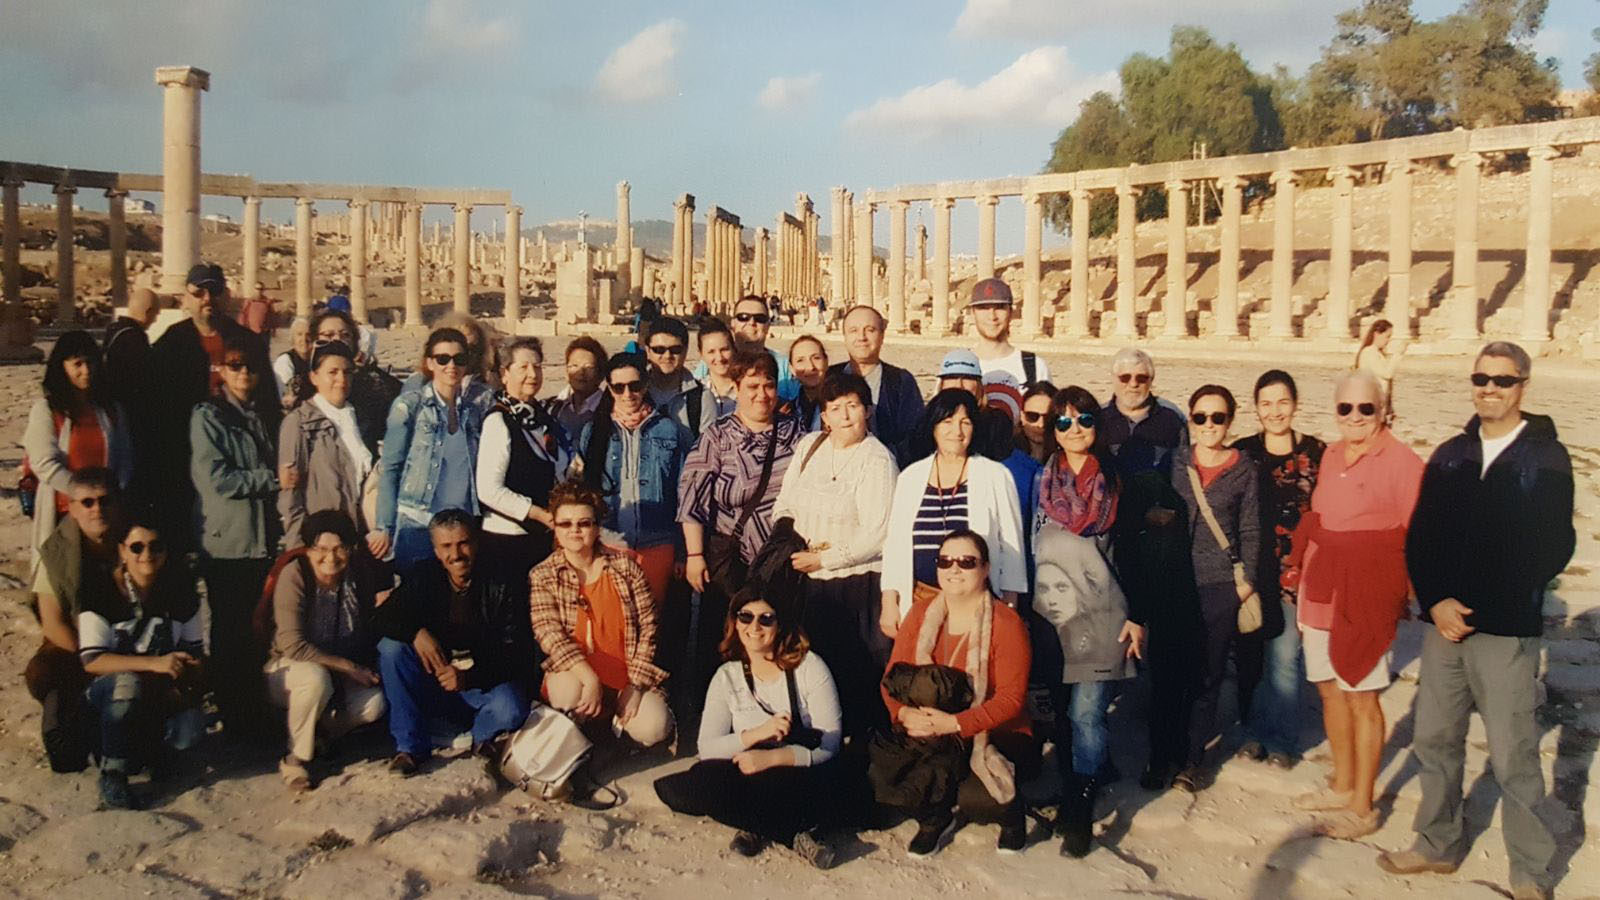 Iordania Jerash